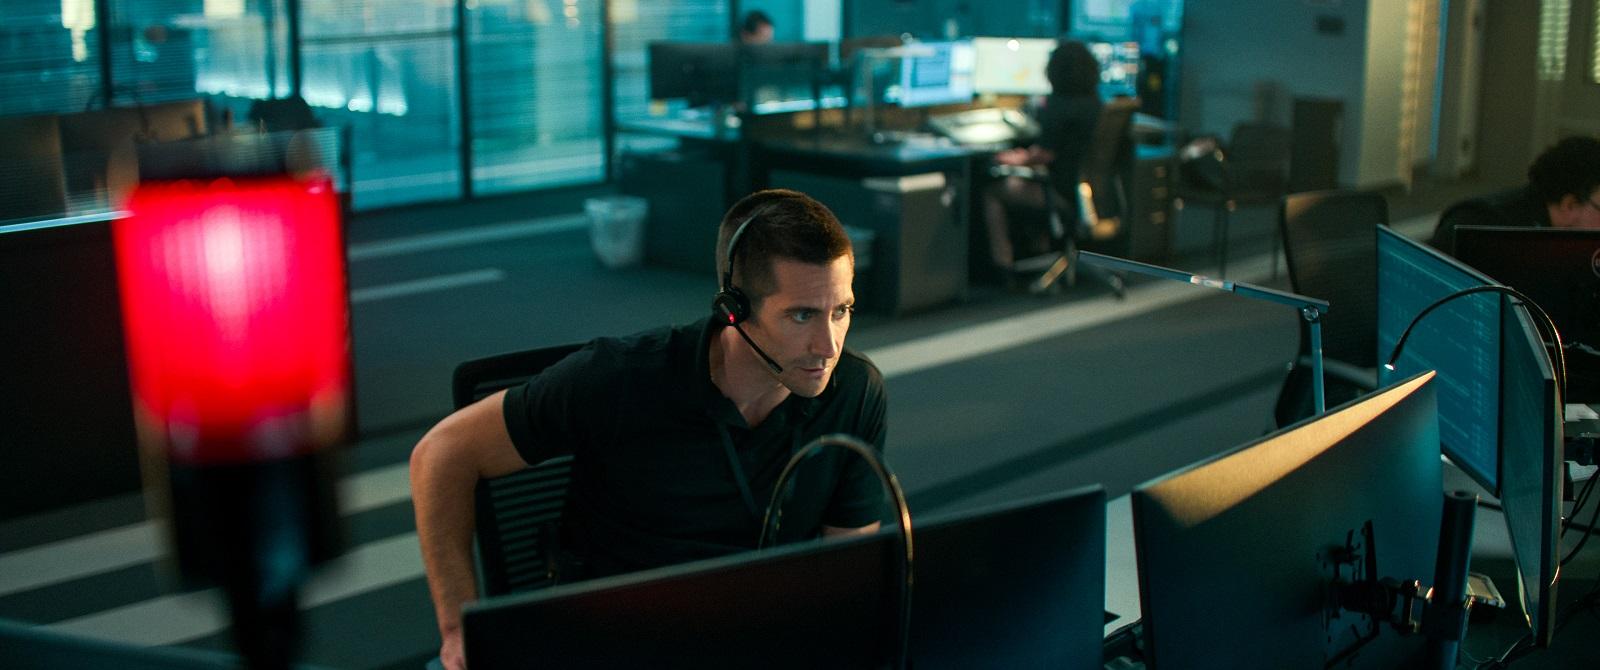 Joe Bayler (Jake Gyllenhaal) - The Guilty © Netflix